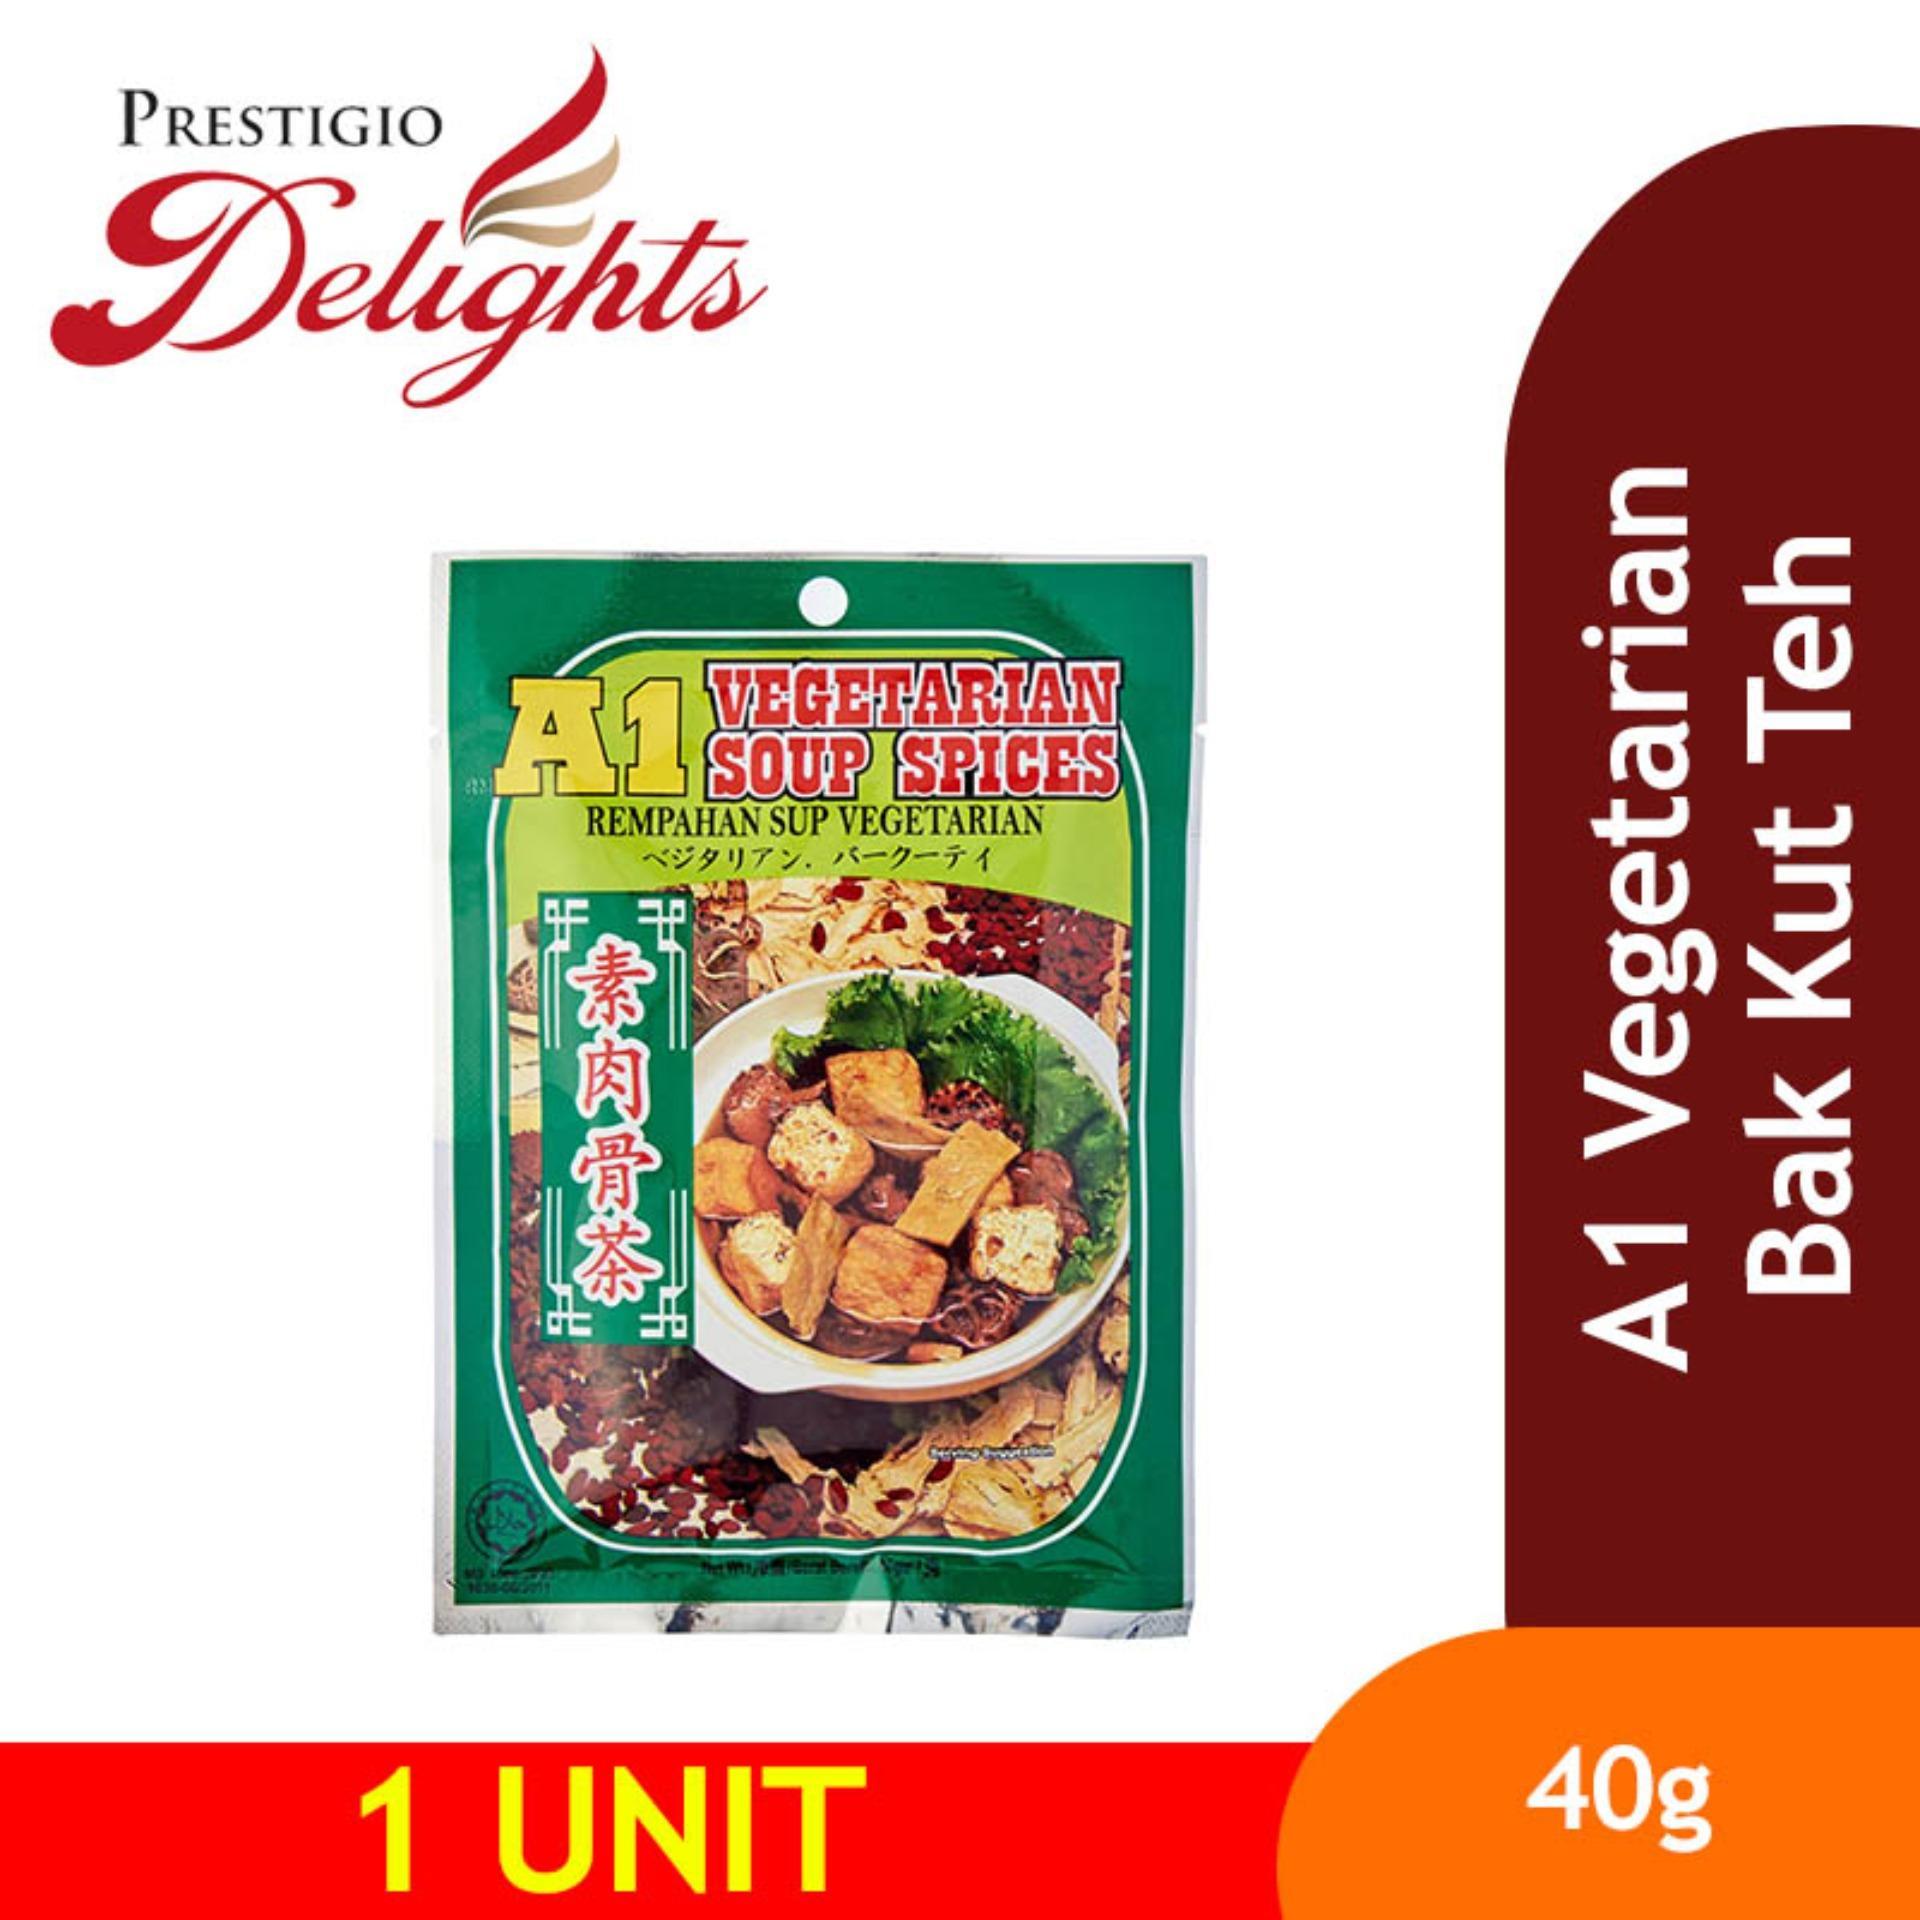 A1 Vegetarian Bak Kut Teh 40g By Prestigio Delights.